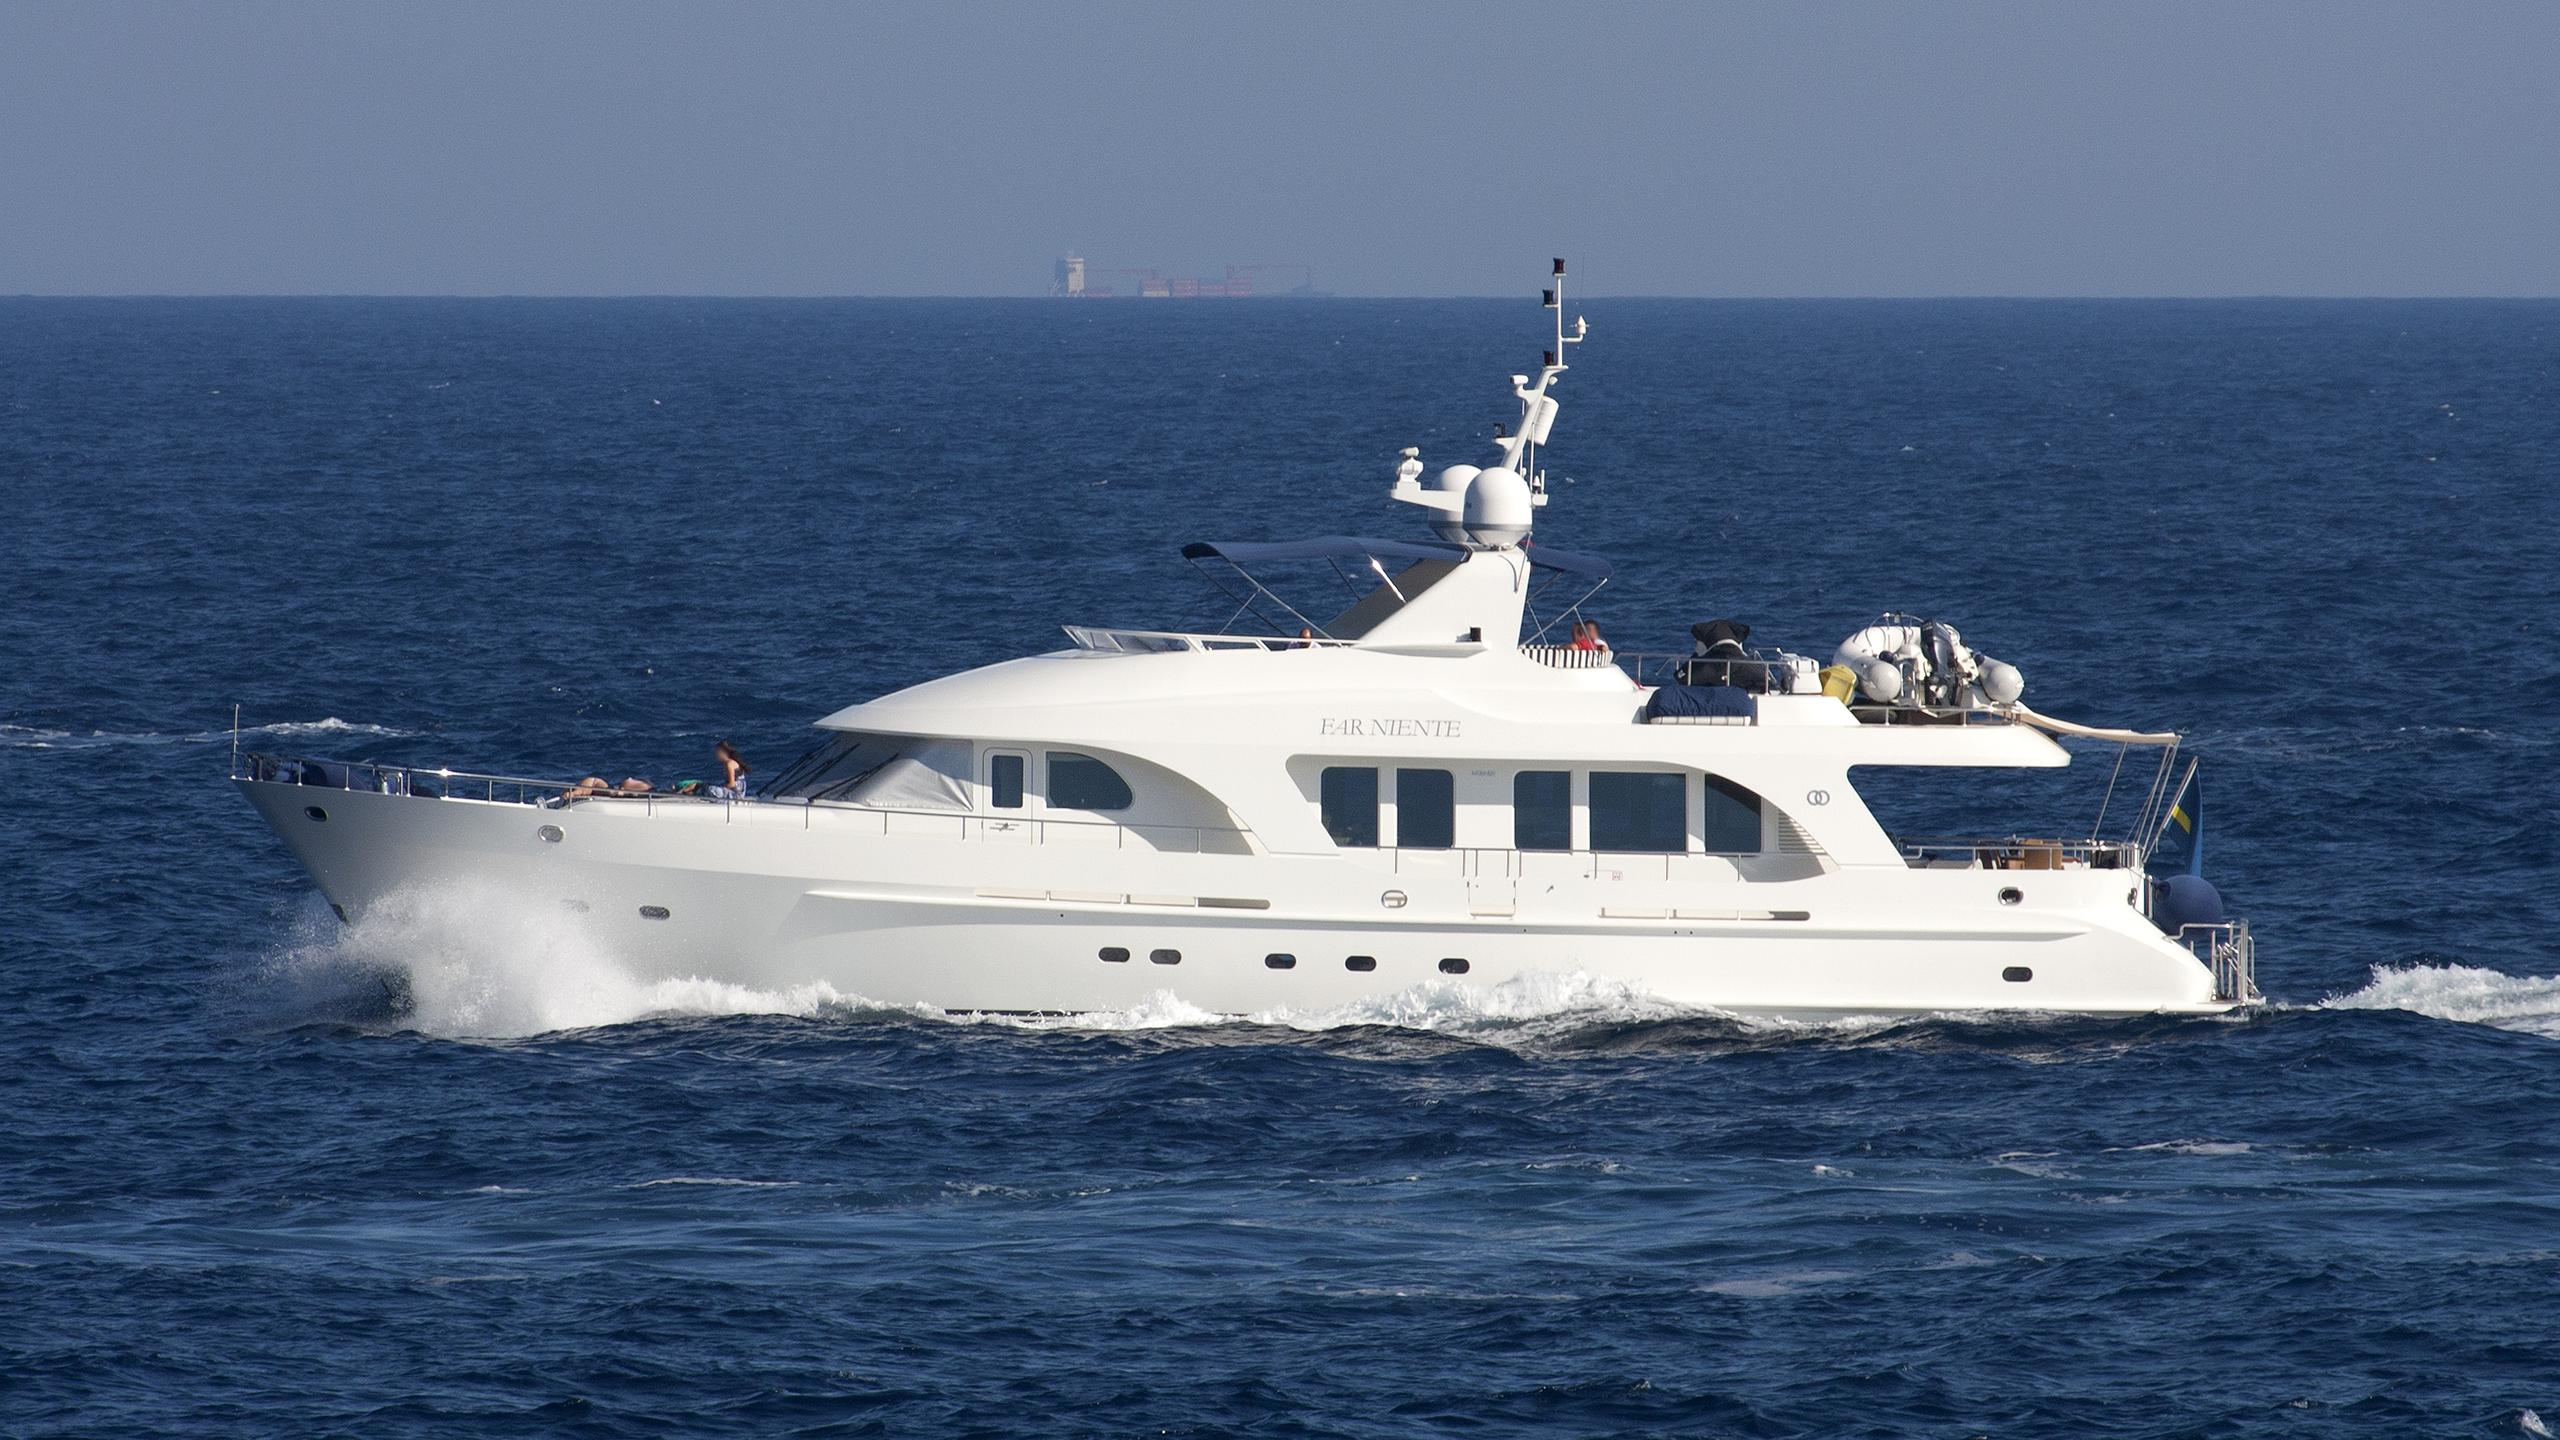 far-niente-yacht-exterior